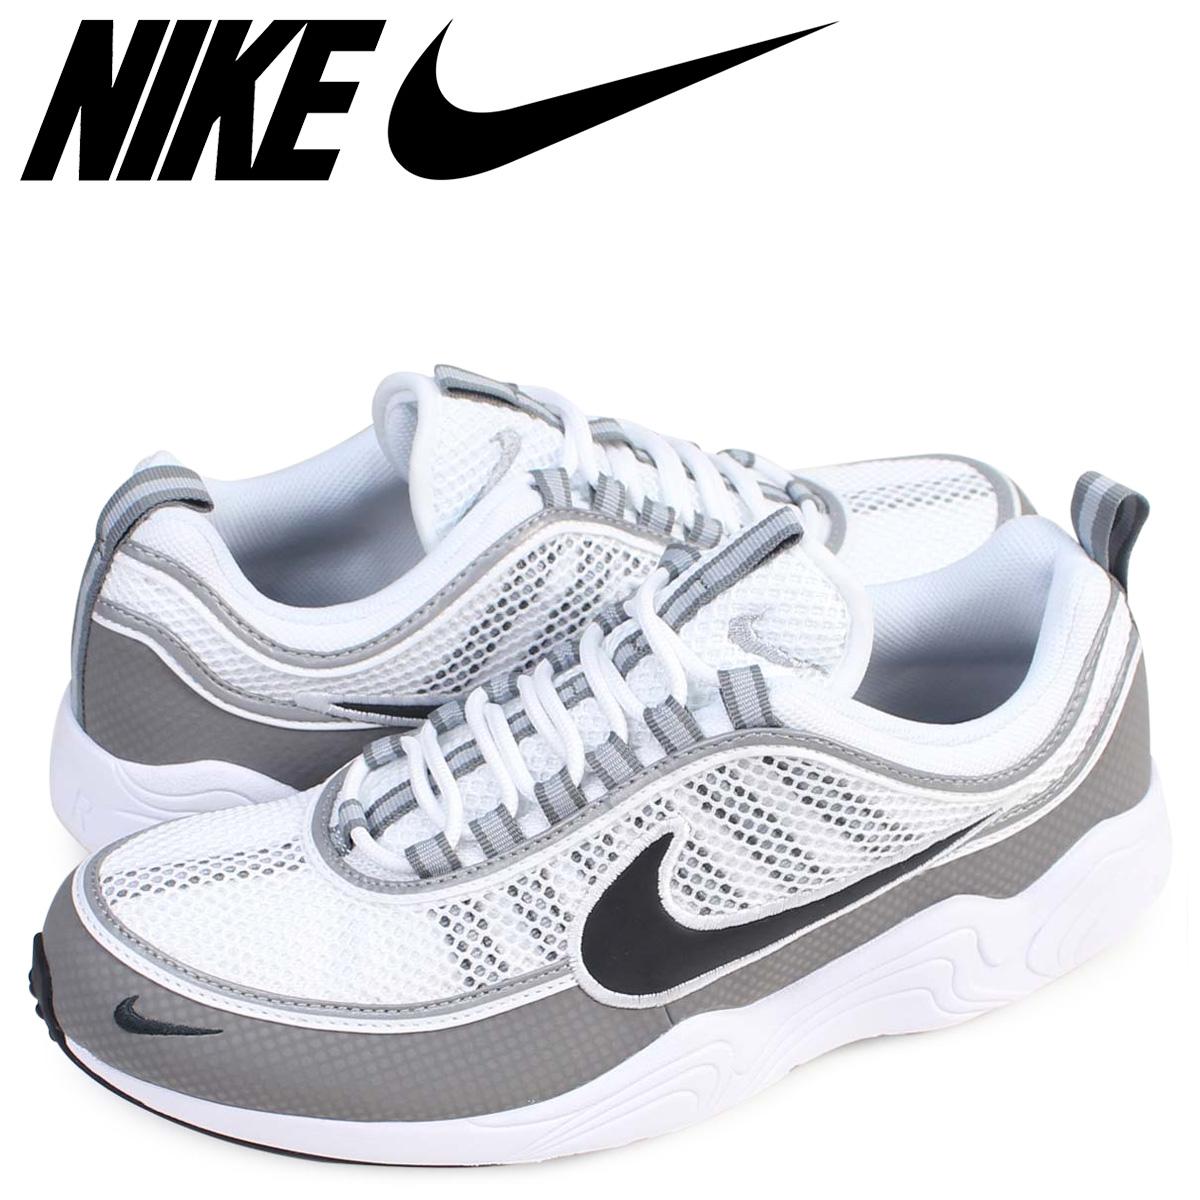 NIKE ナイキ エア ズーム スピリドン スニーカー AIR ZOOM SPRDN 849776-101 メンズ 靴 ホワイト 【zzi】